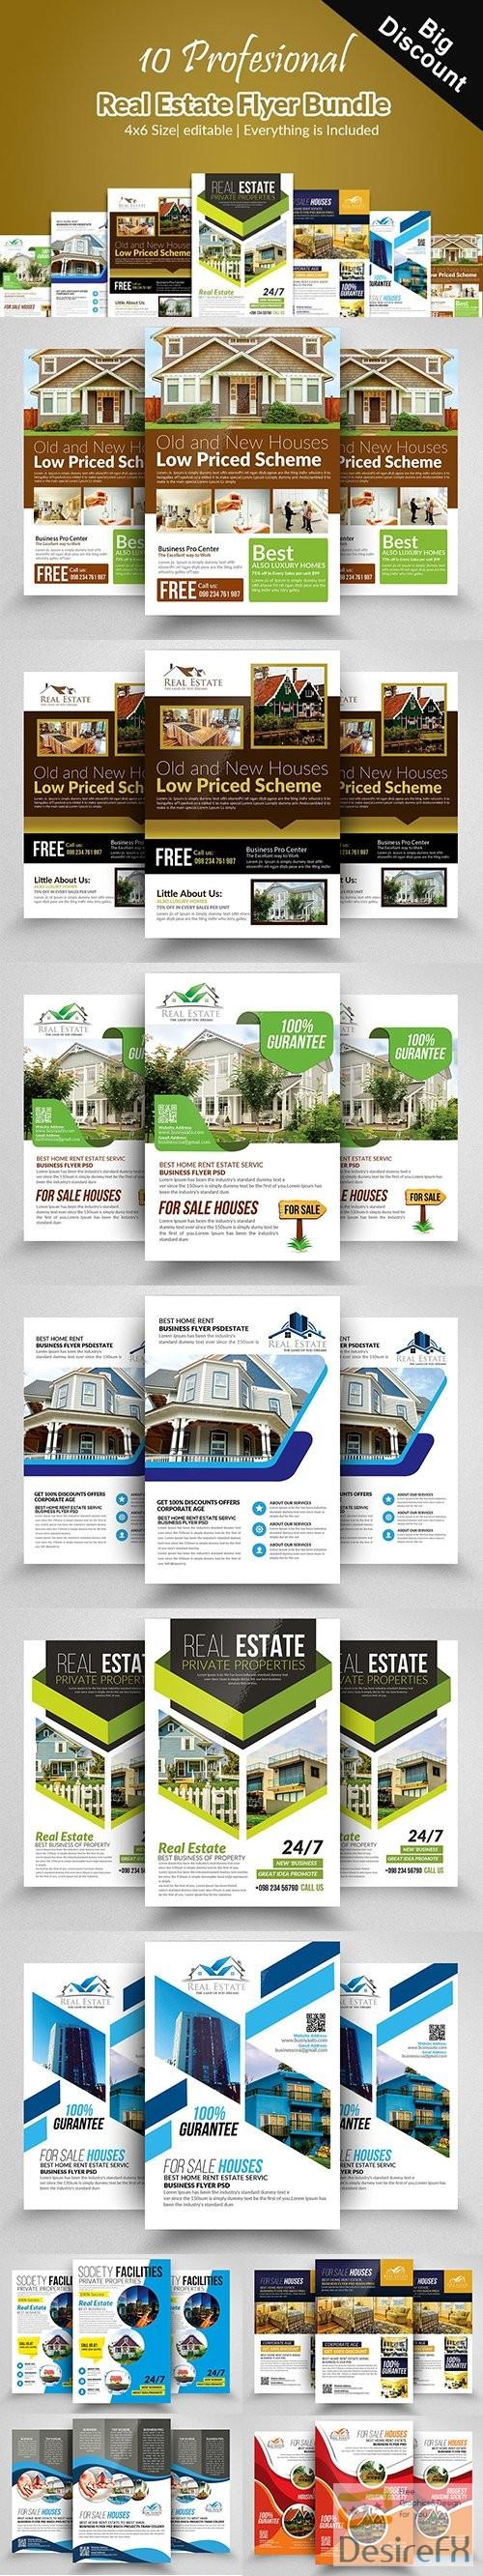 layered-psd - CM - 10 Real Estate Flyers Bundle 2351629